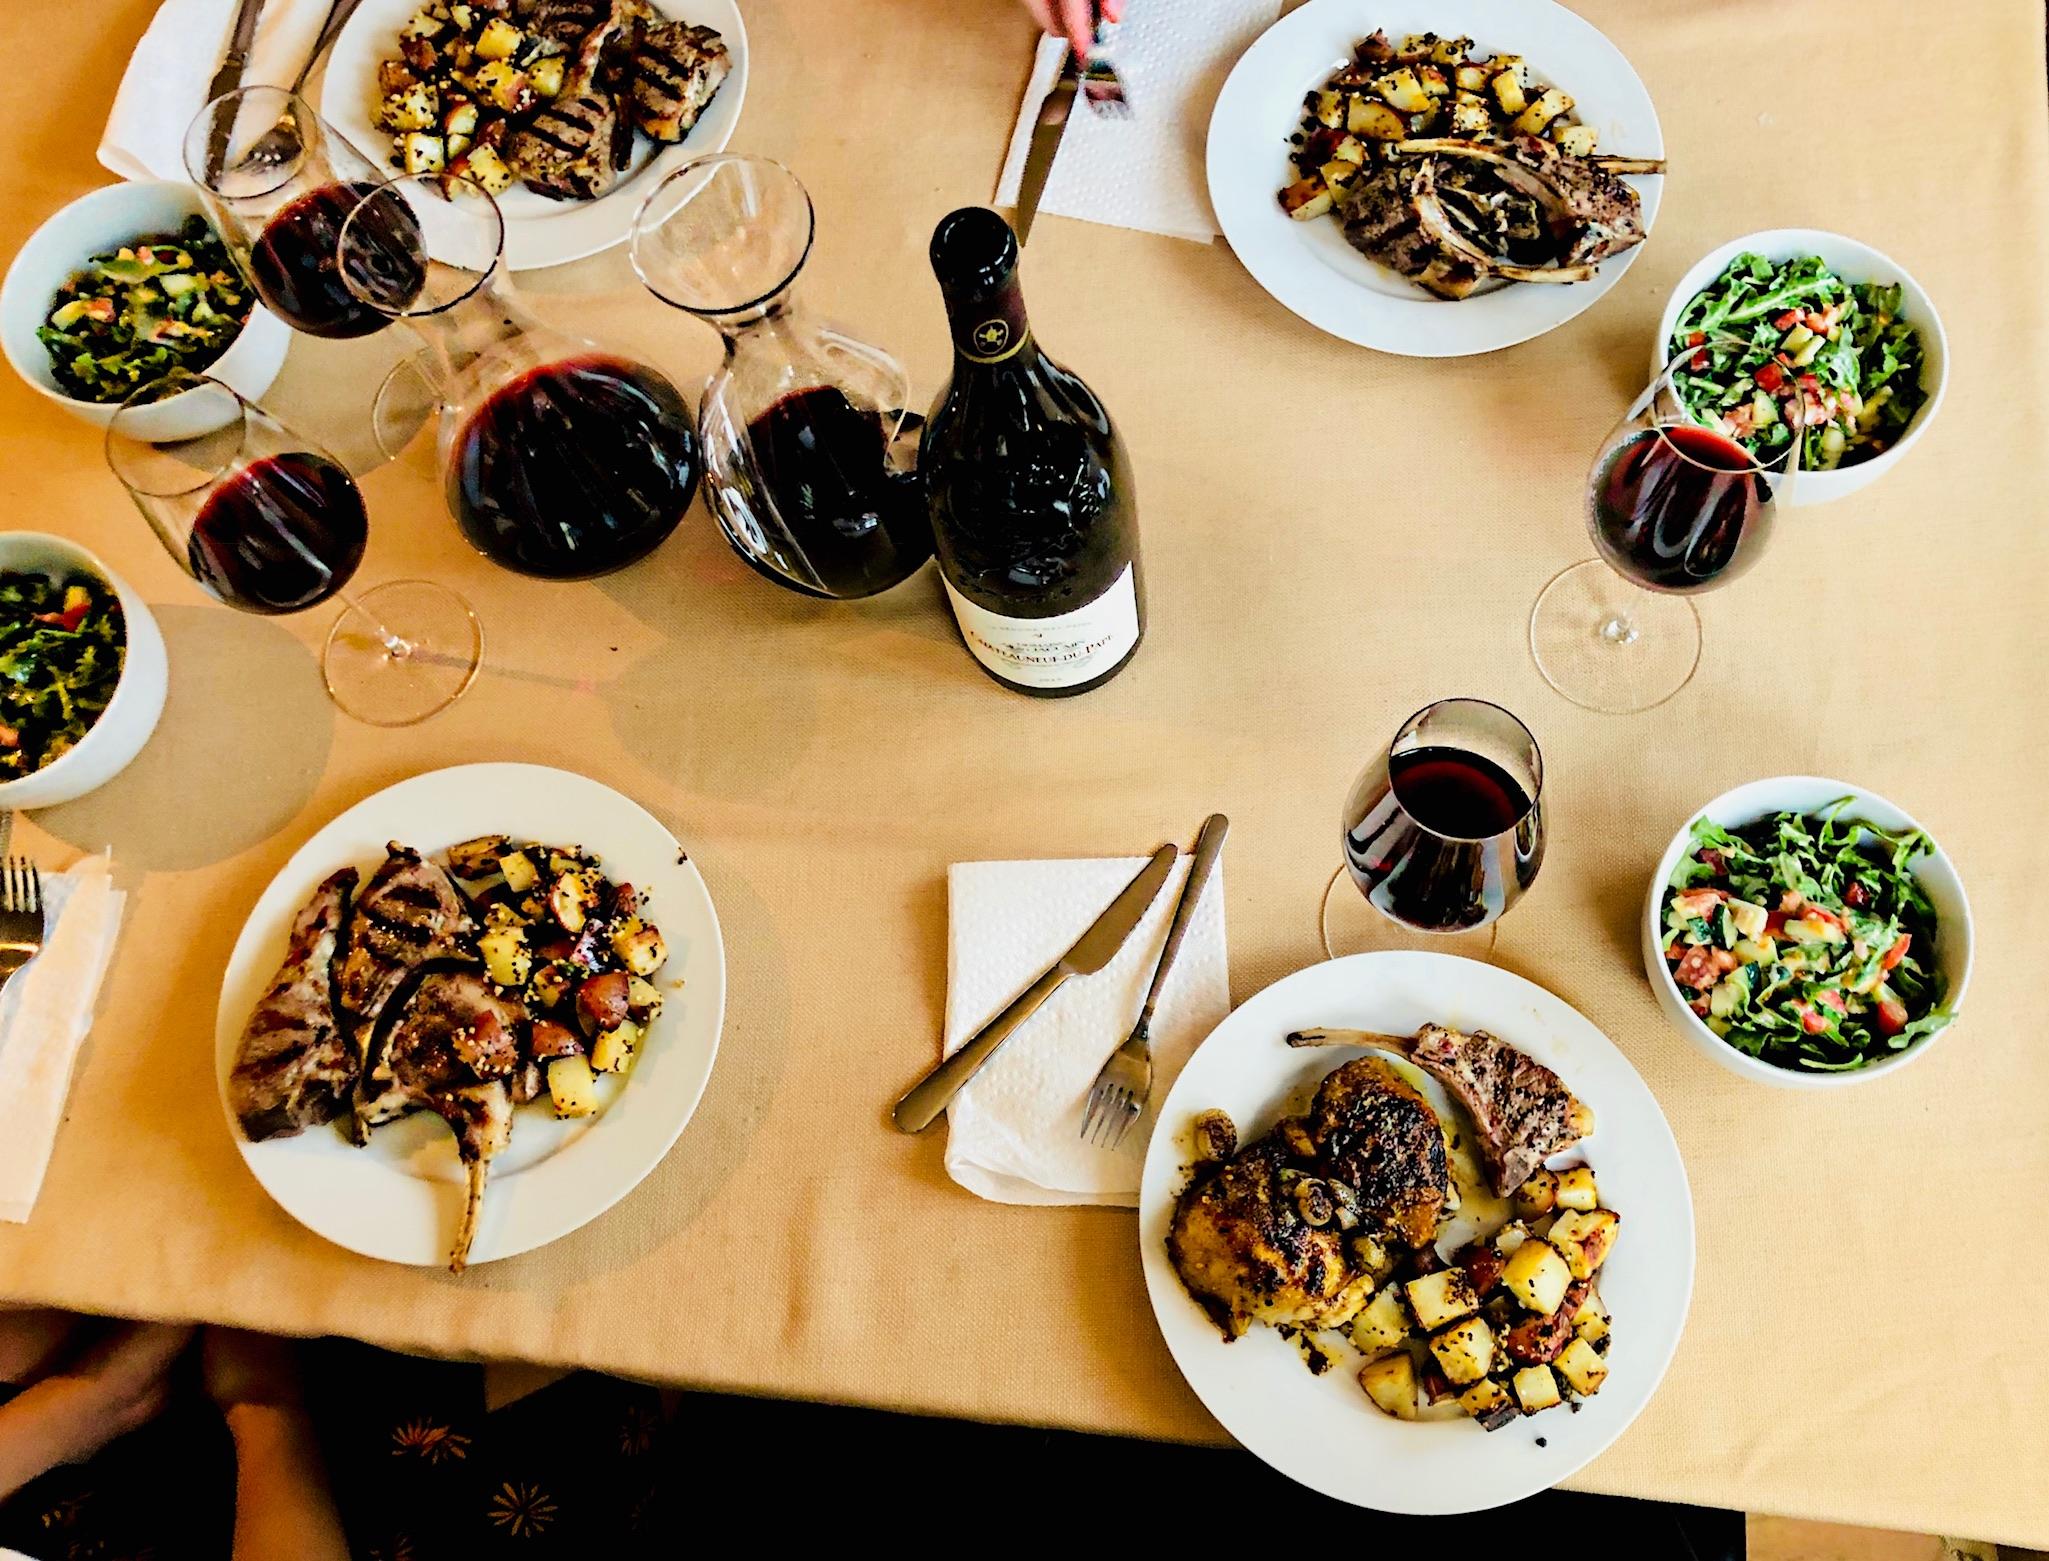 Try this Wine: Contrasting Food & Wine Pairings